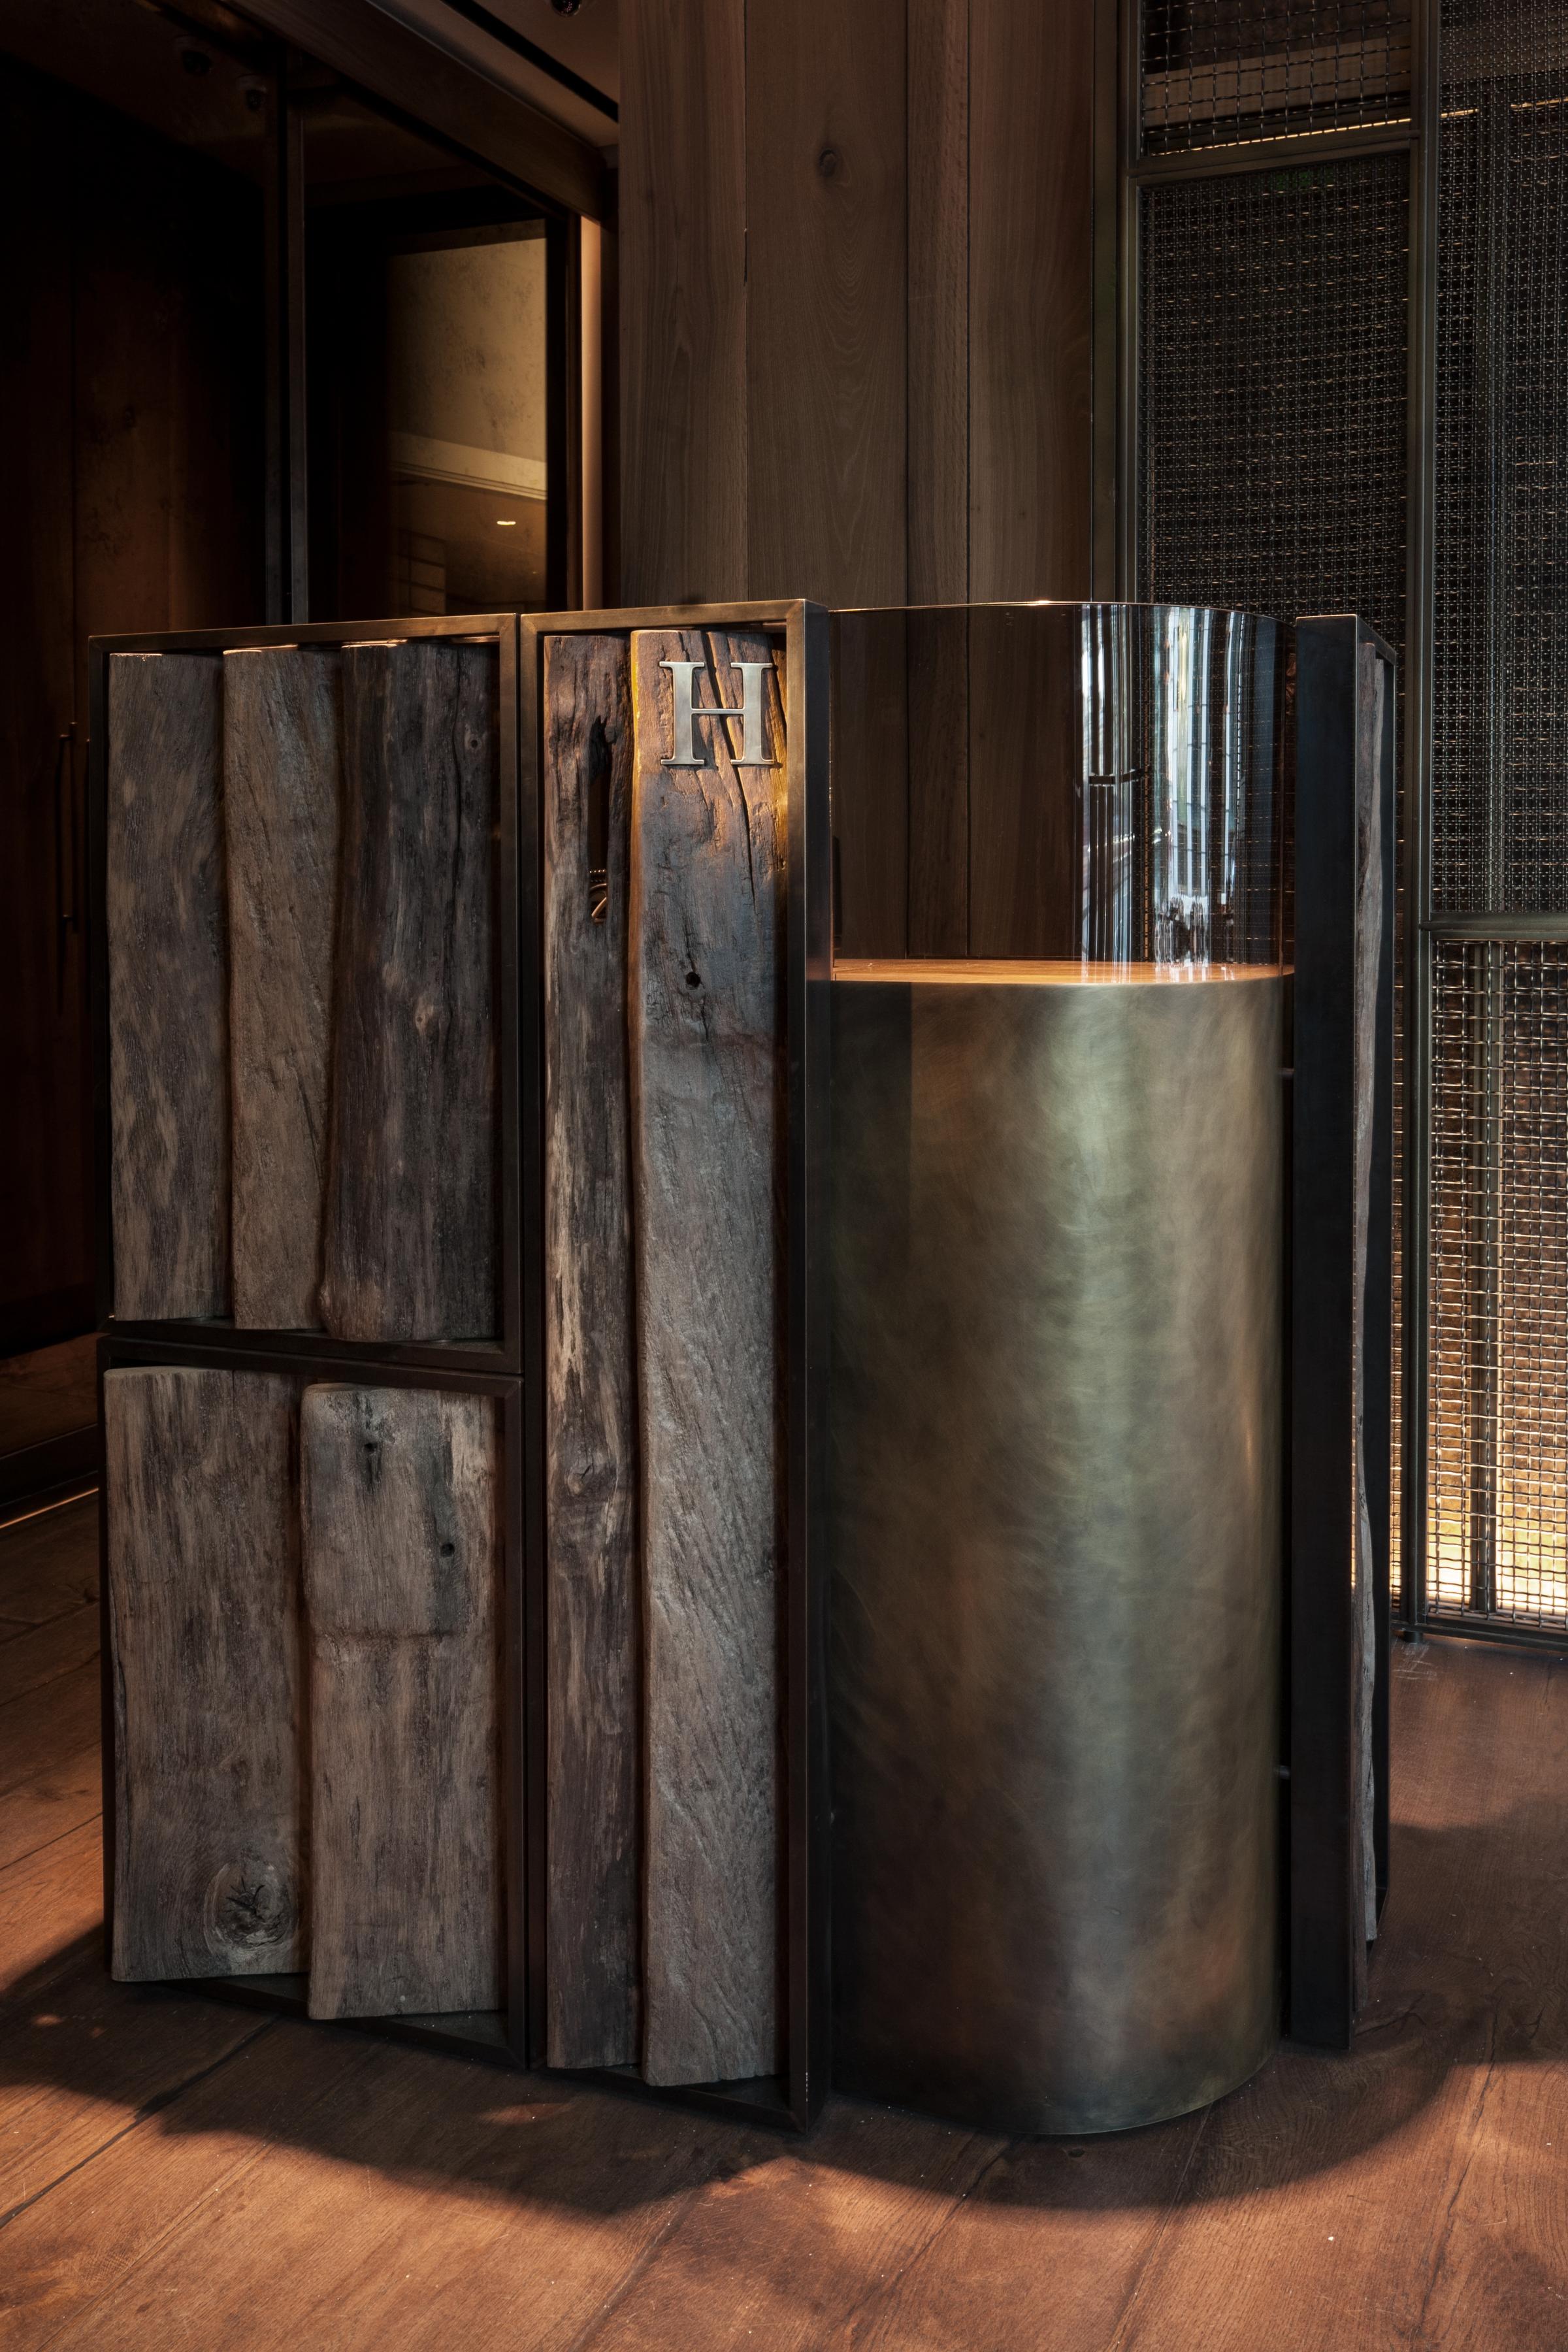 These White Walls Studio Interior Design Hide Restaurant London Bespoke Furniture Design Reception Desk Patinated Brass Reclaimed Wood.jpg